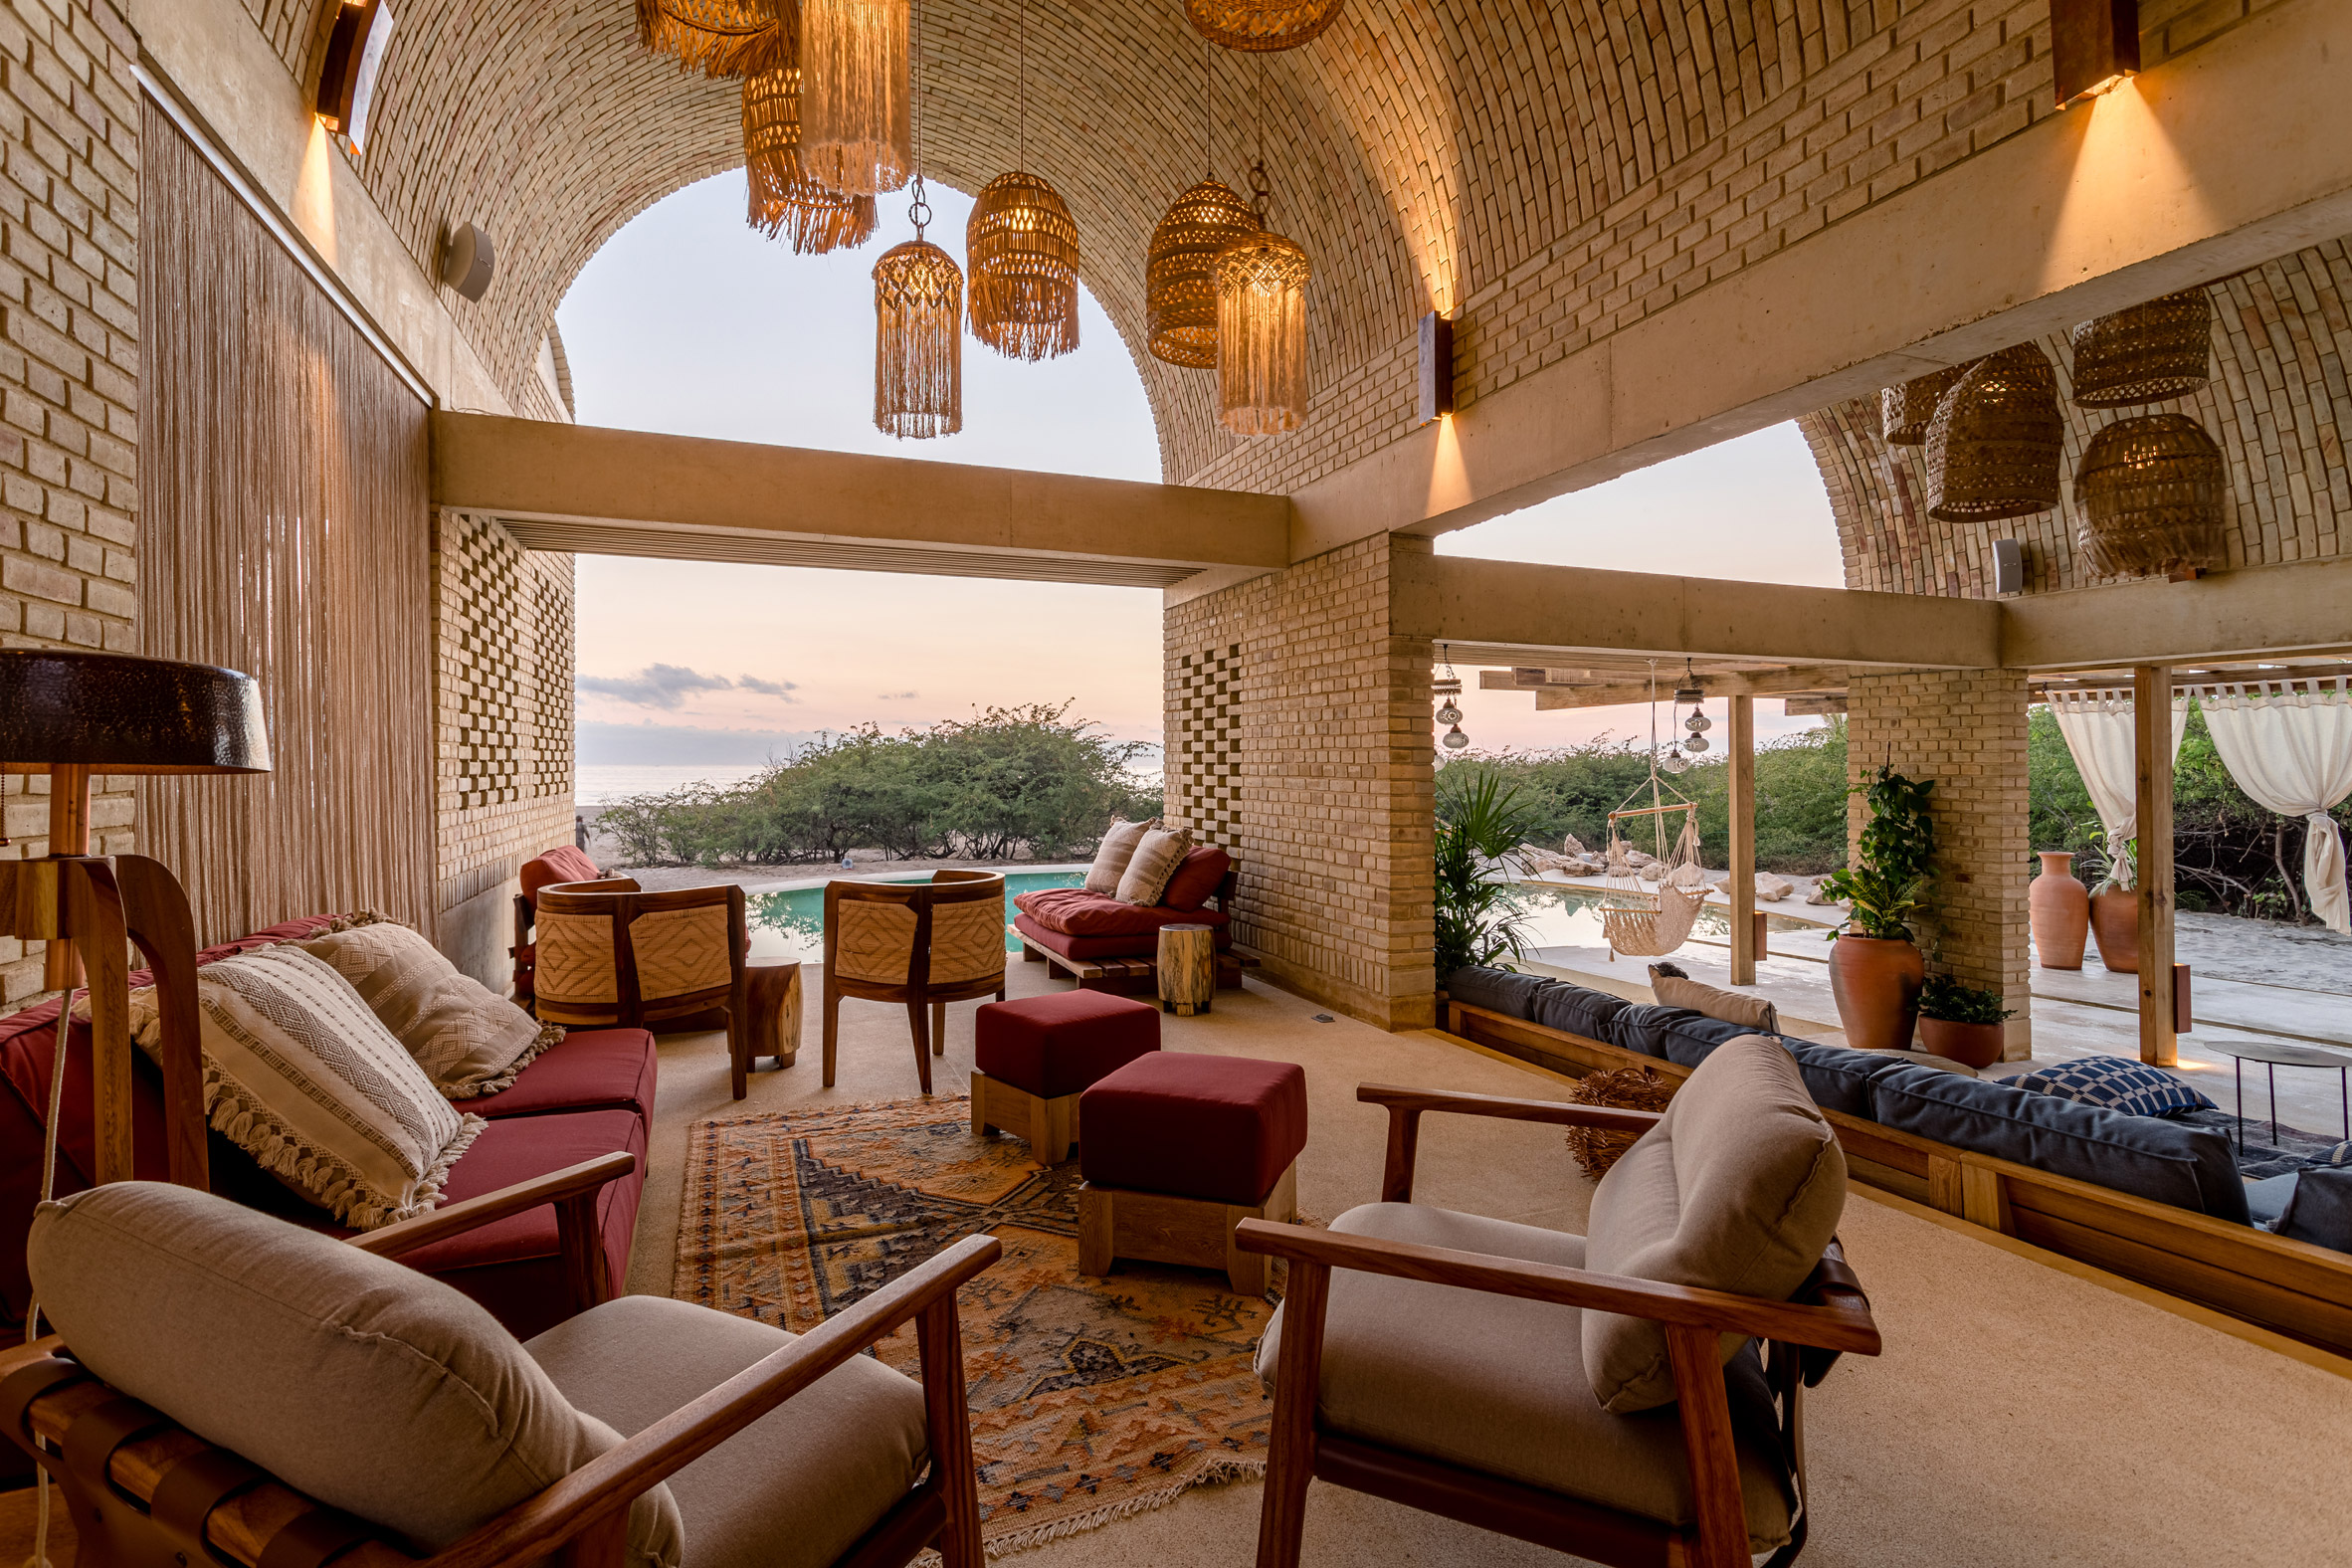 Alberto Kalach designed the hotel